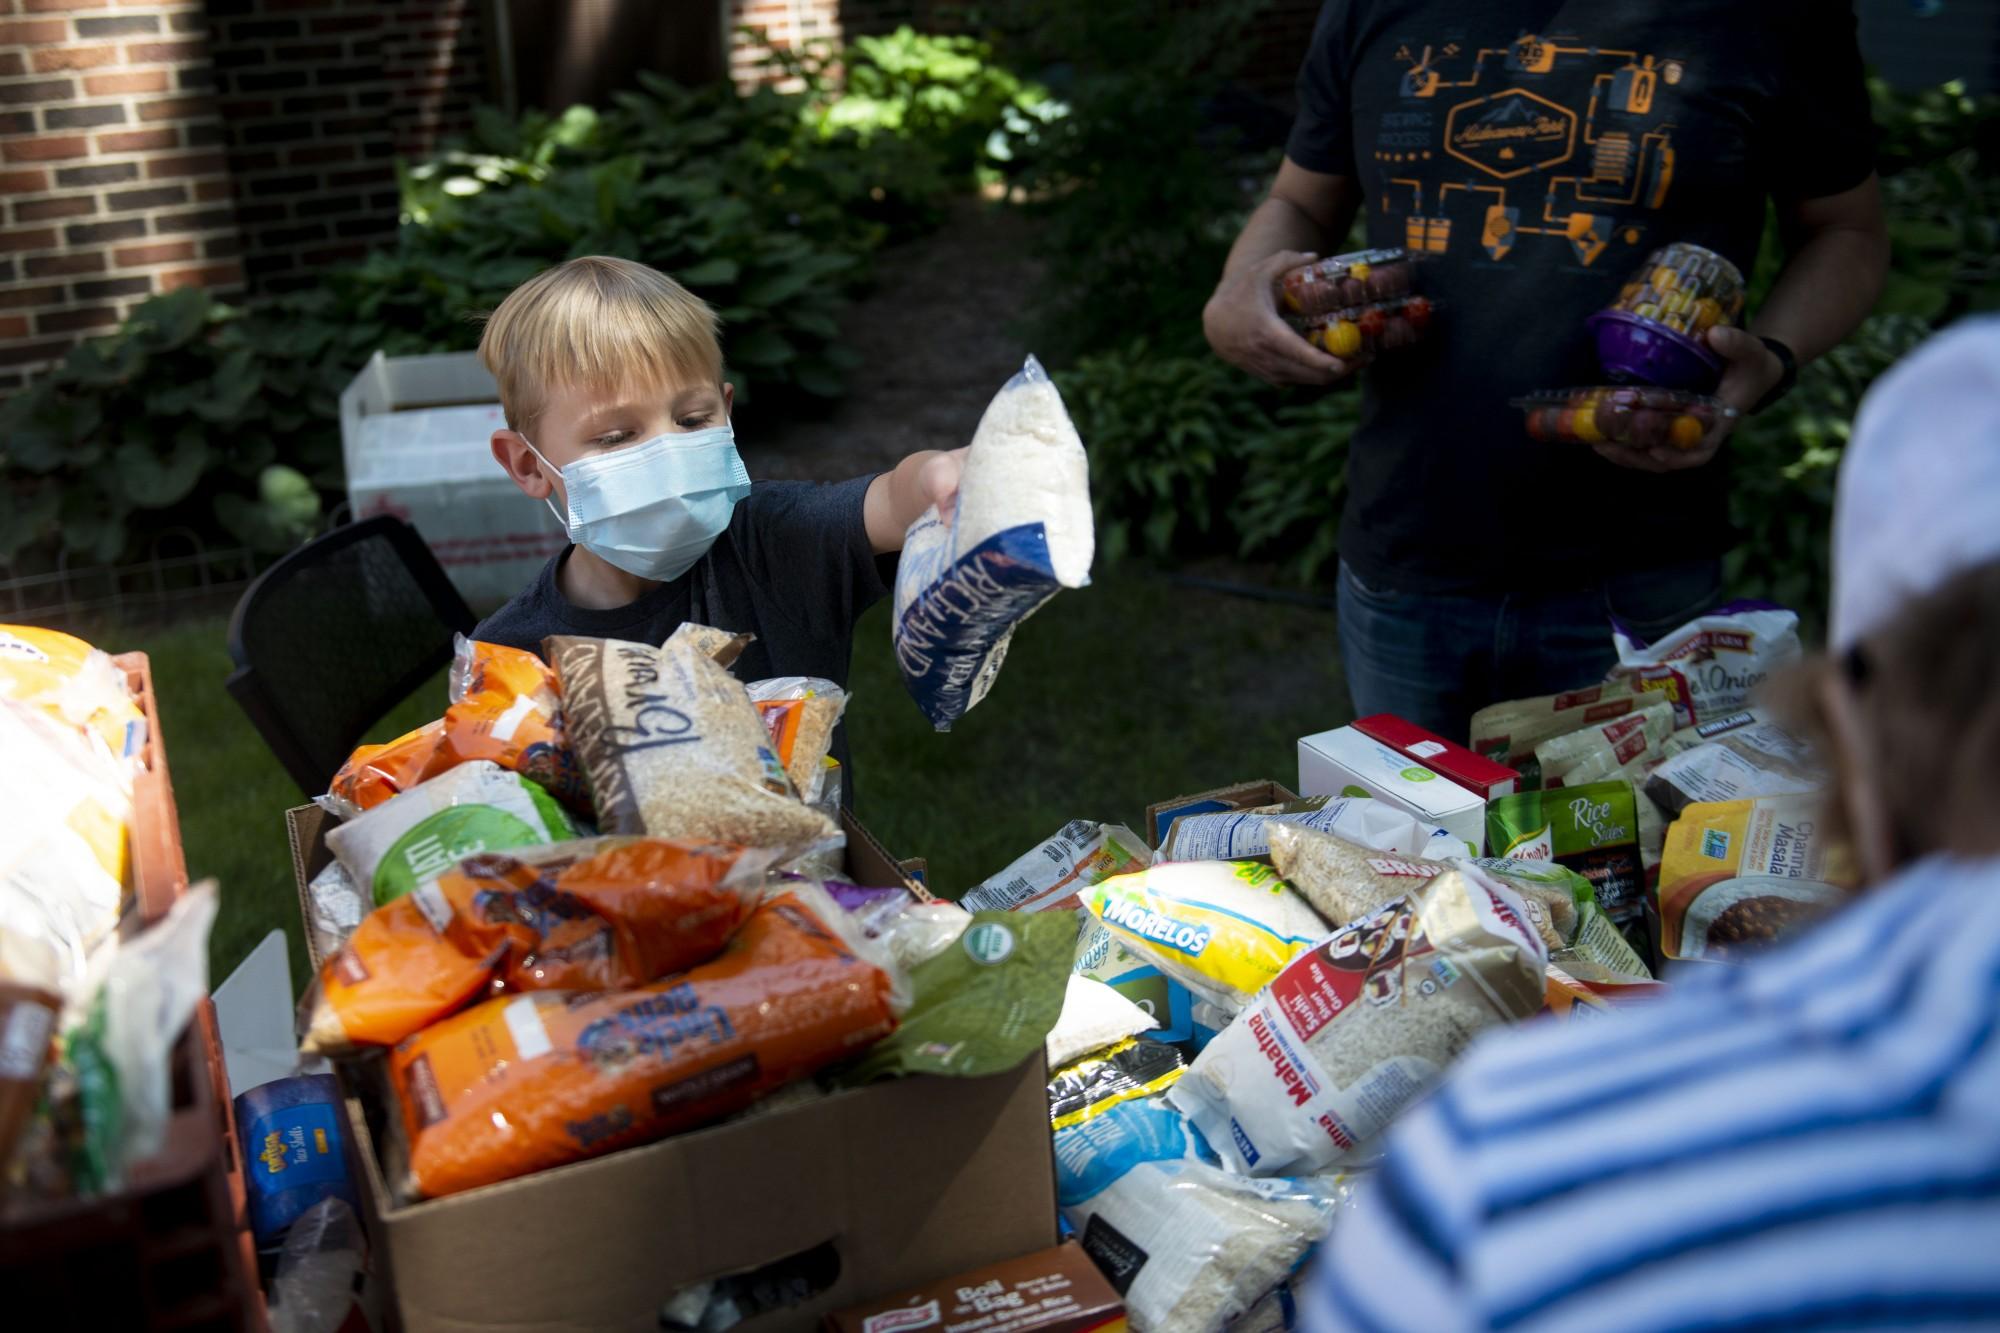 Luca Maki (7) helps organize donated rice at Holy Trinity Lutheran Church on Sunday, May 31.